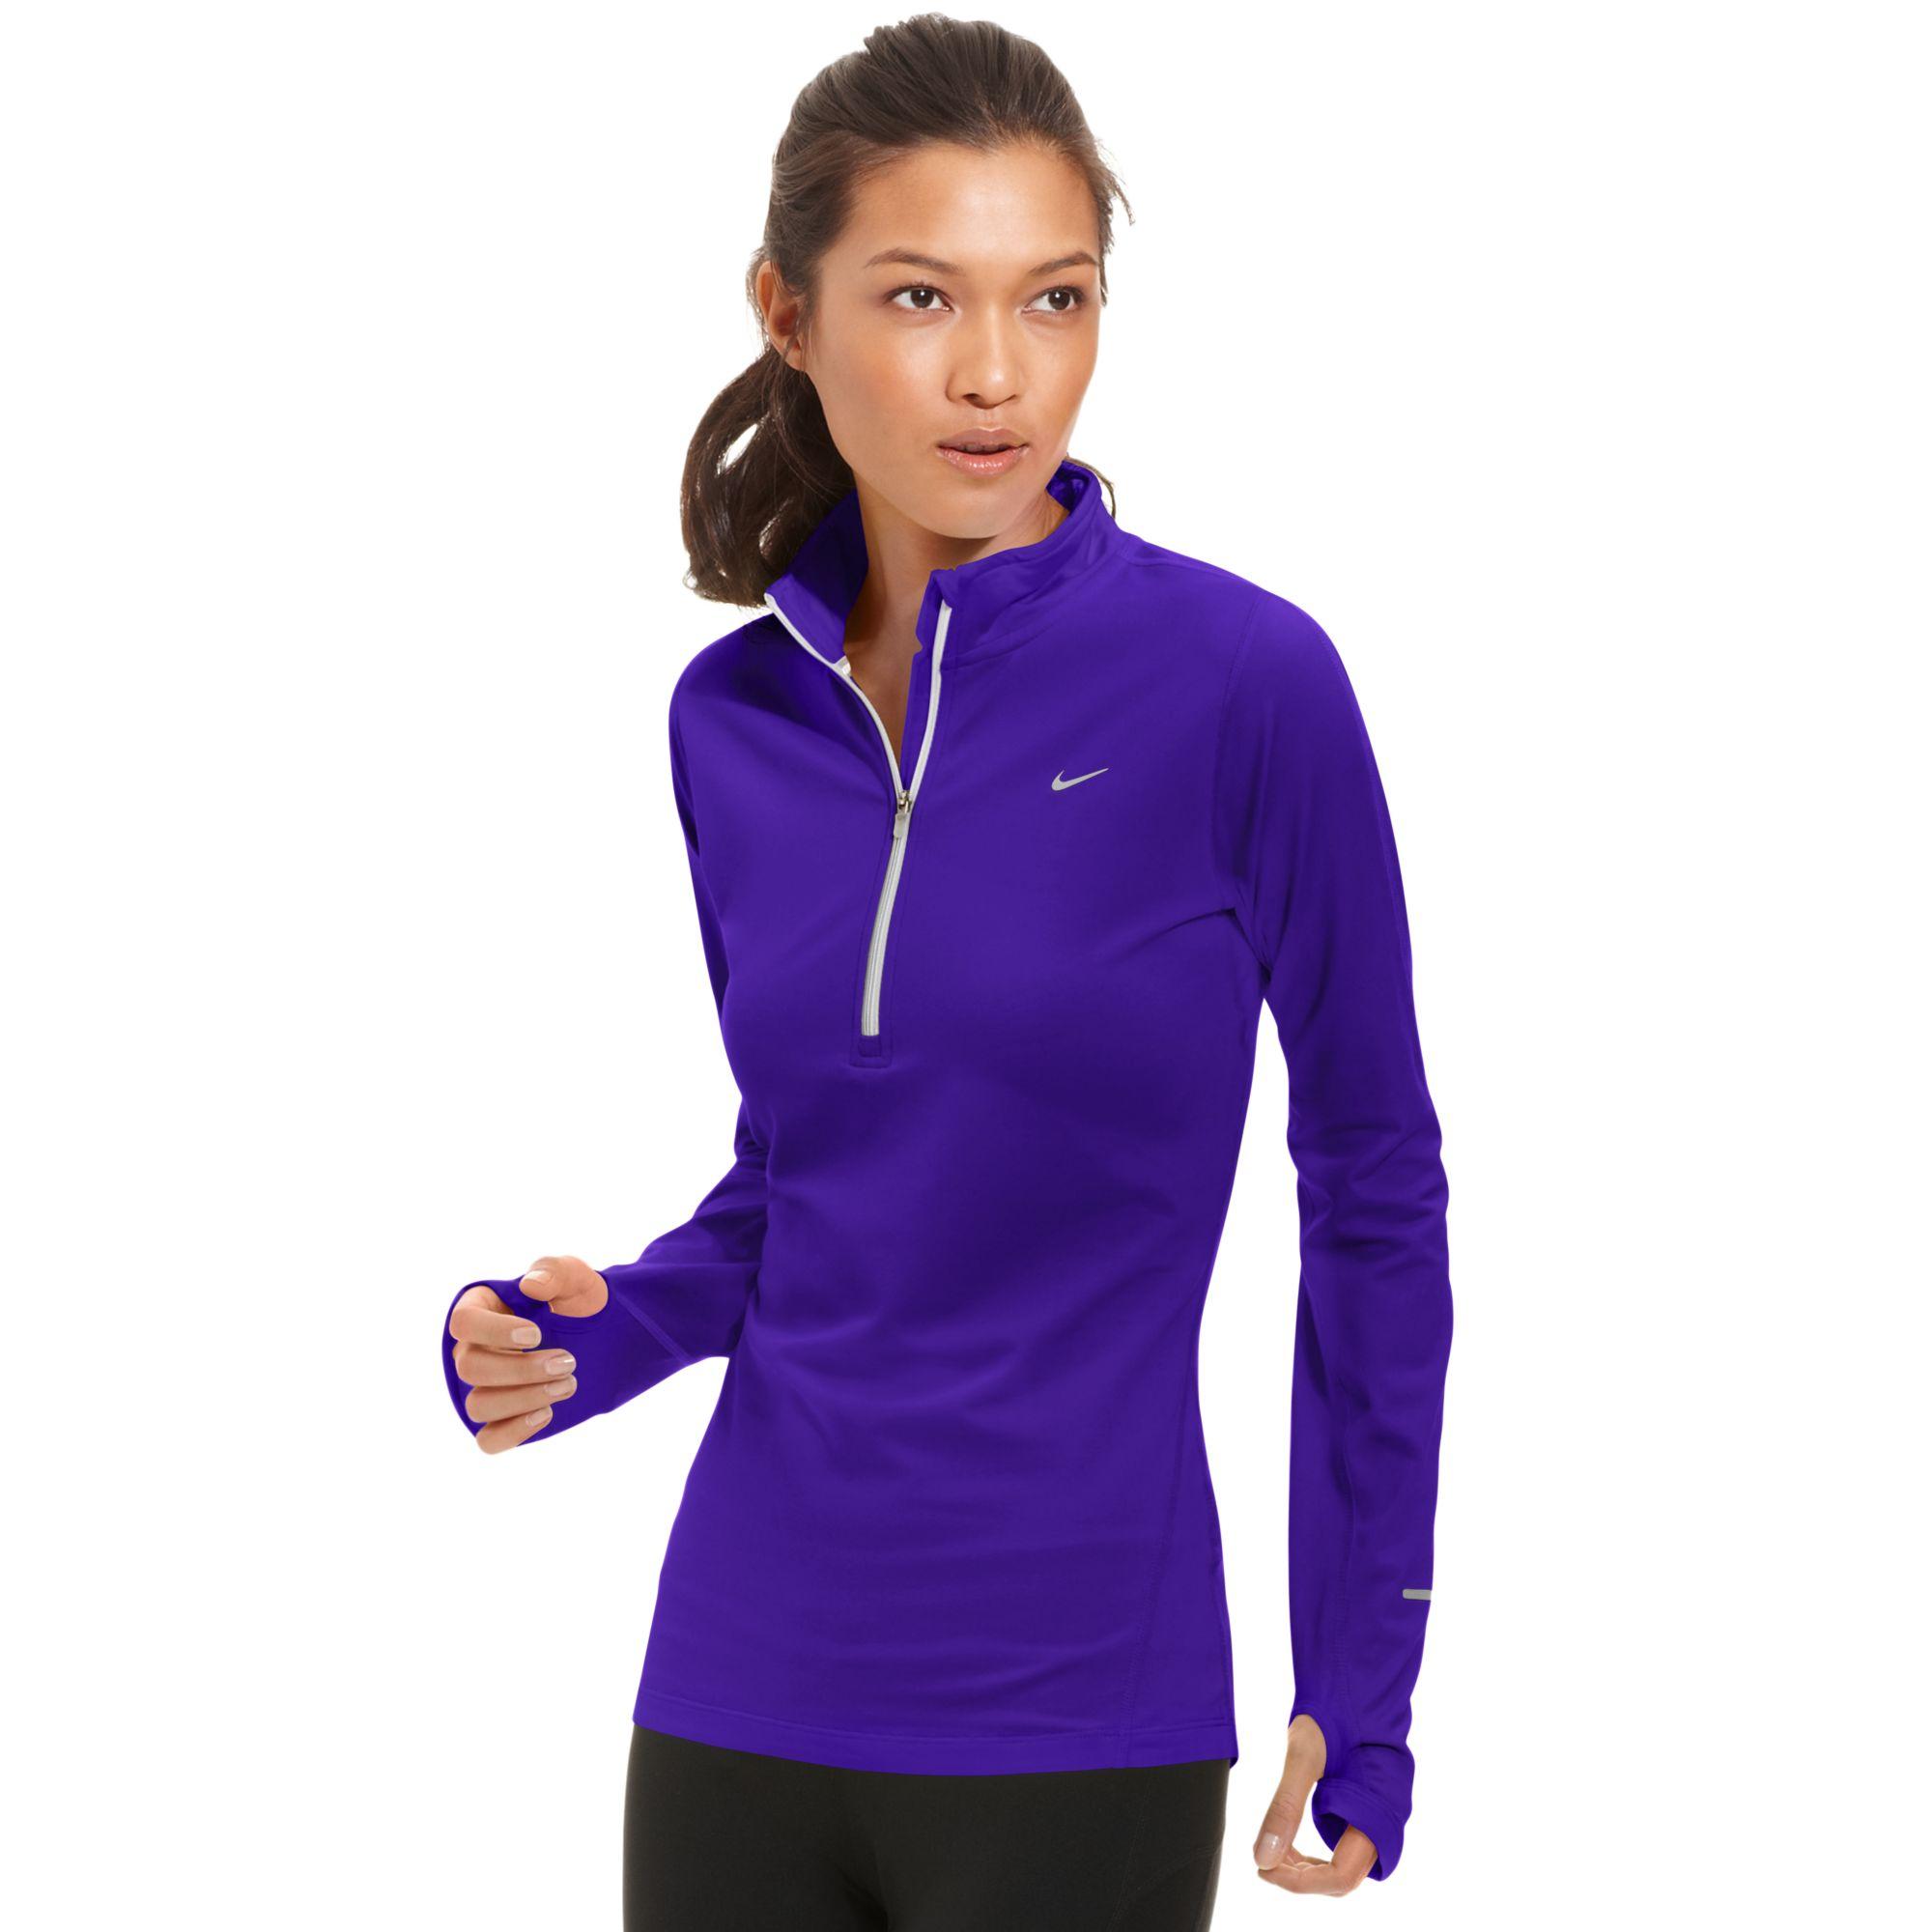 Nike Element Longsleeve Drifit Halfzip Pullover In Blue